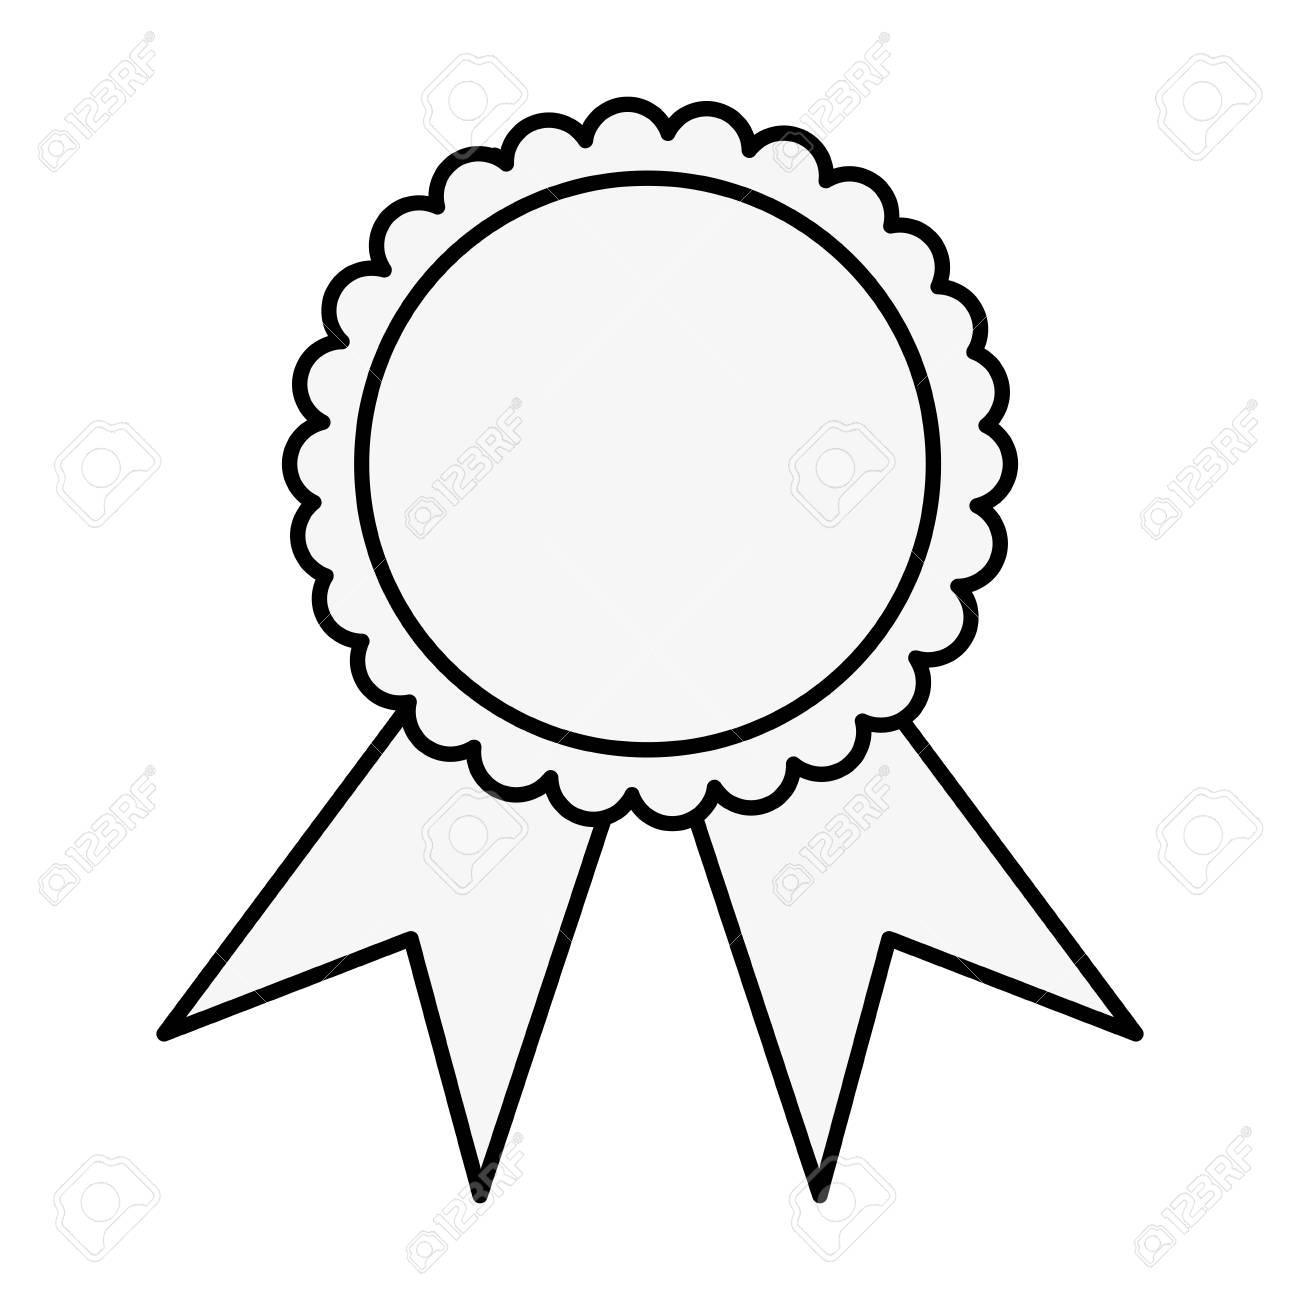 Award ribbon symbol icon vector illustration graphic design.